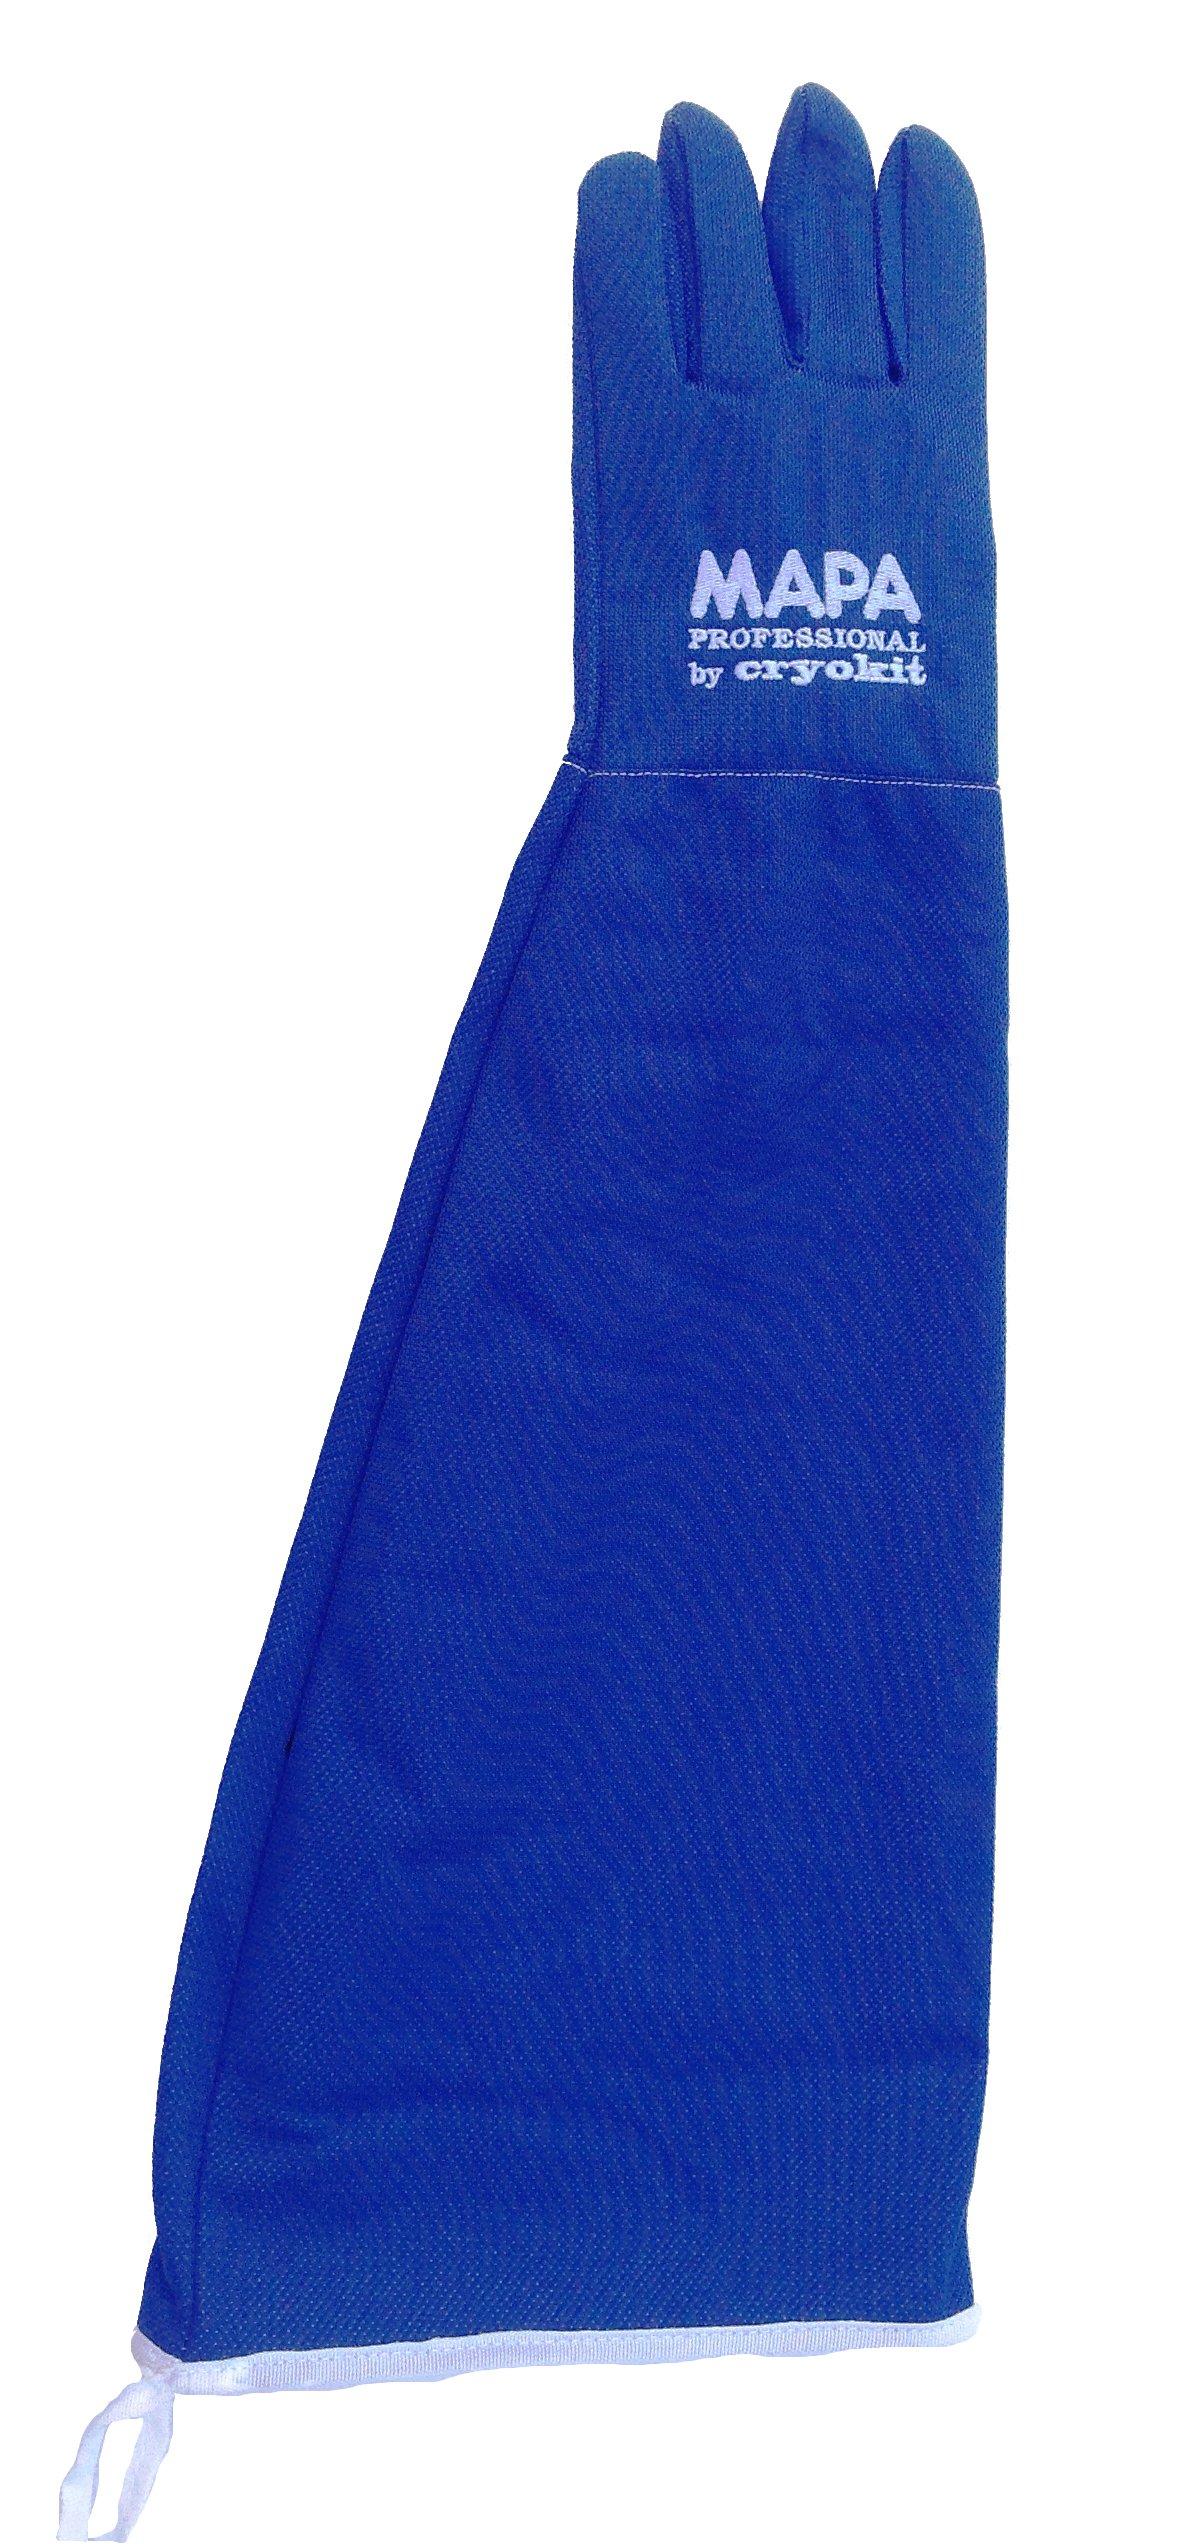 MAPA Professional CRYPLS216509 CRYOPLUS-2.1 65 Cryogenic Glove, Cryoplus 2.1 65 (26''-Sh), Size 9, PR 1, Blue